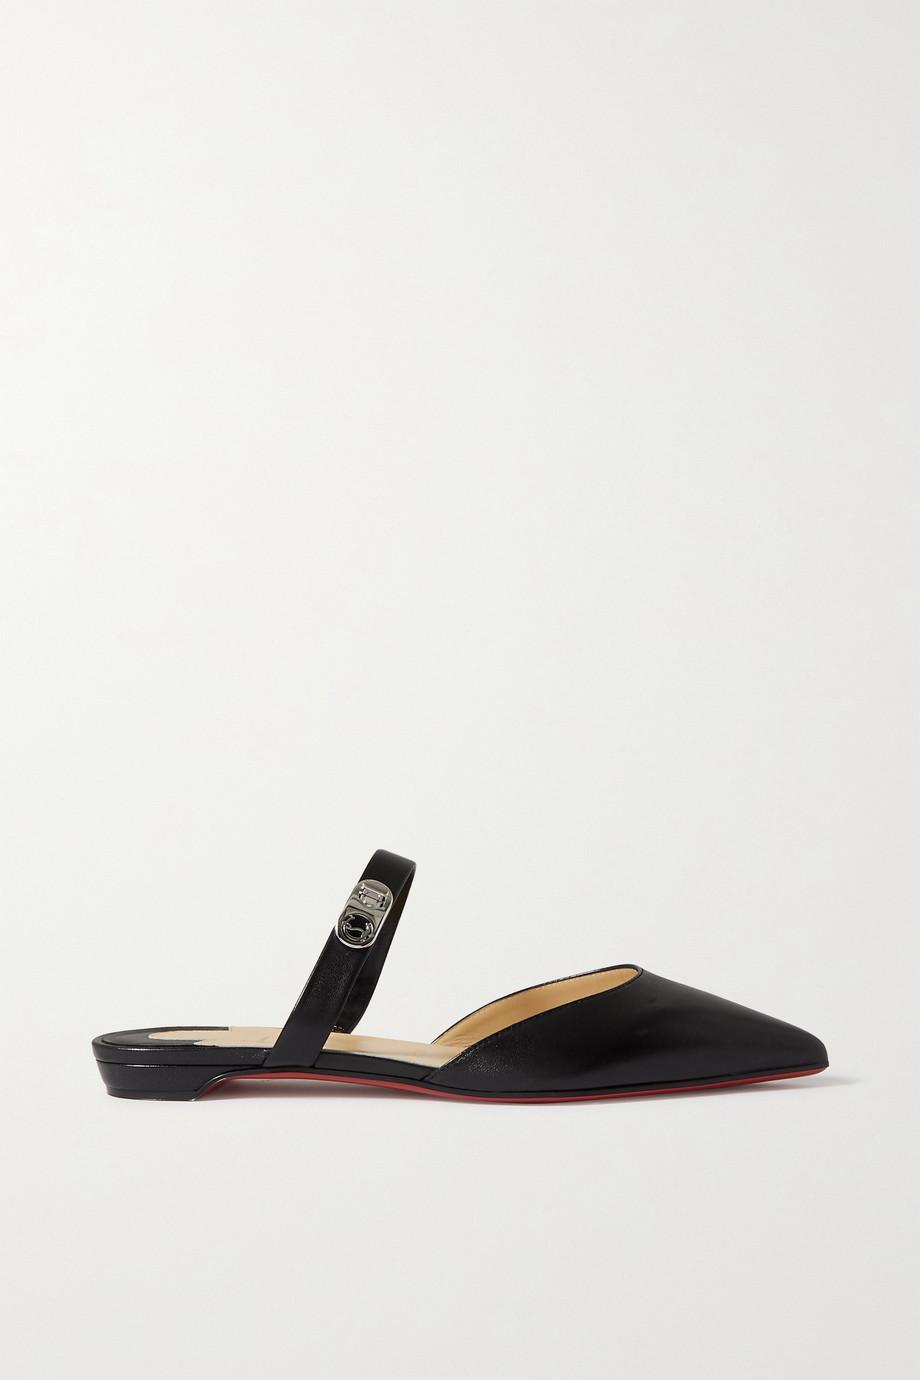 Christian Louboutin Chaussures plates à bouts pointus en cuir Choc Lock